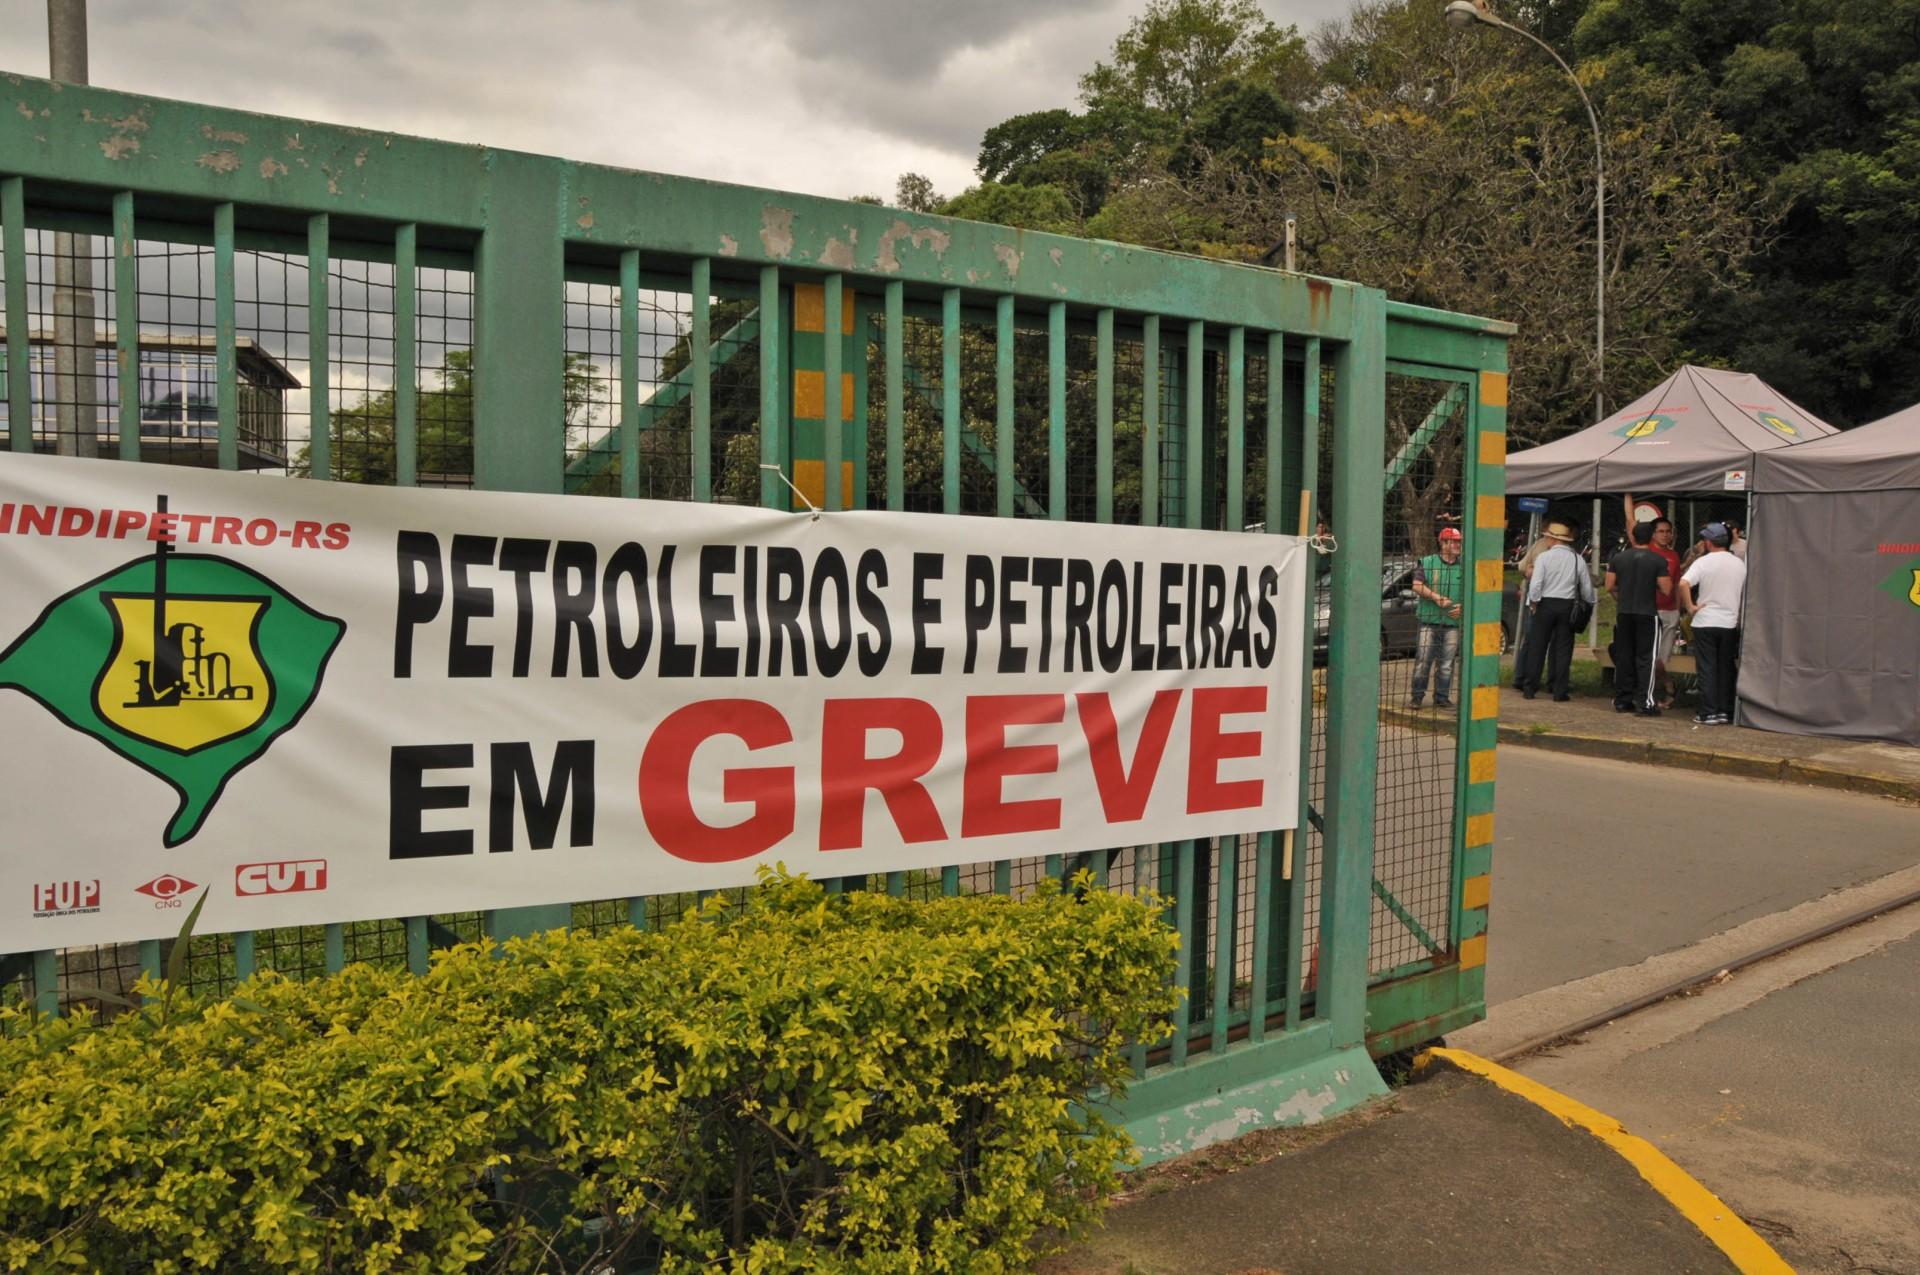 greve_petroleiros___paulo_pires-1155299